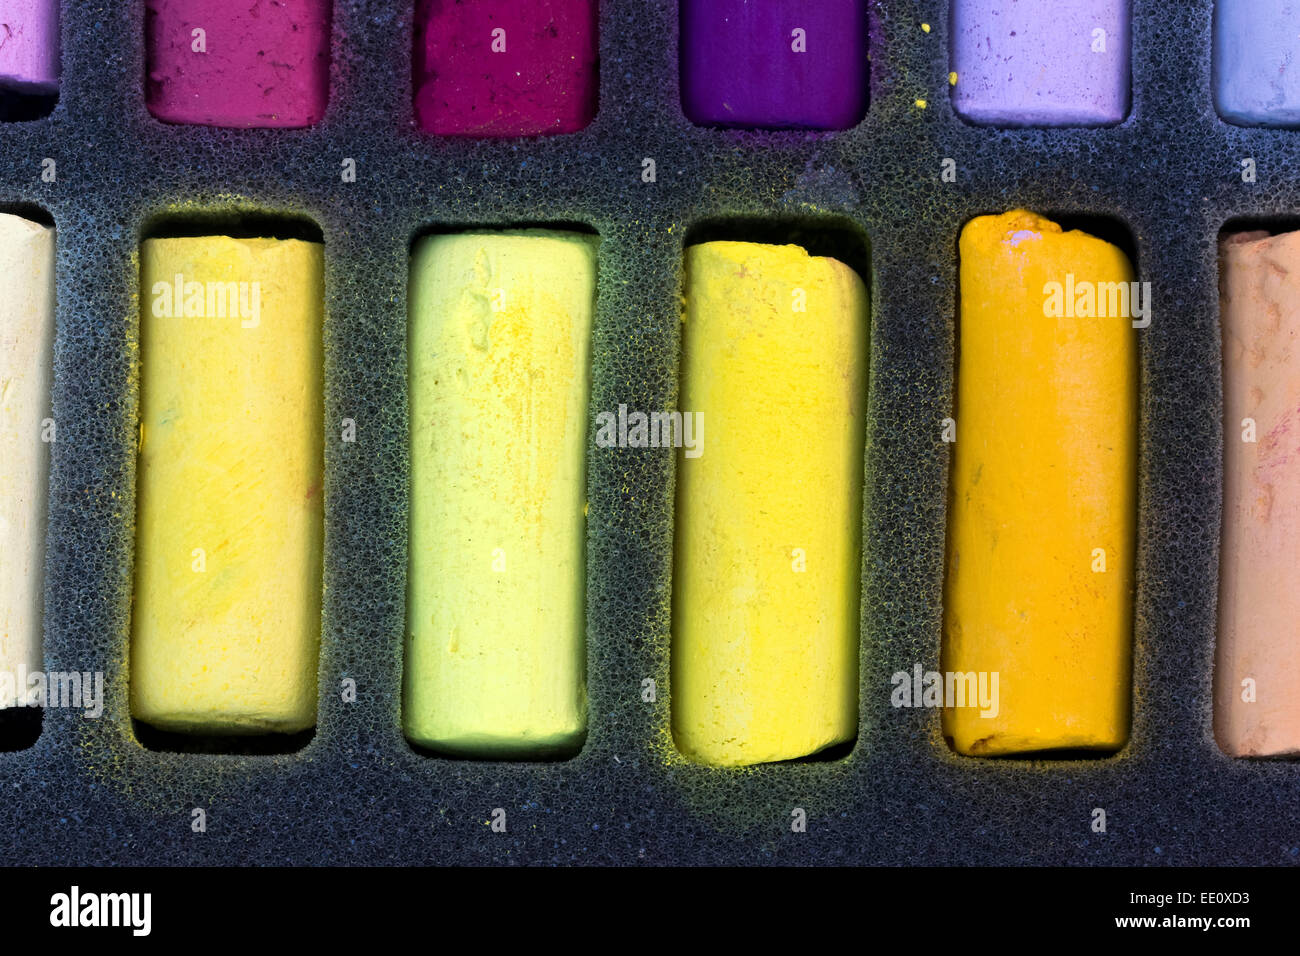 Chalk Pastel Set, yellow pigmented pastels - Stock Image